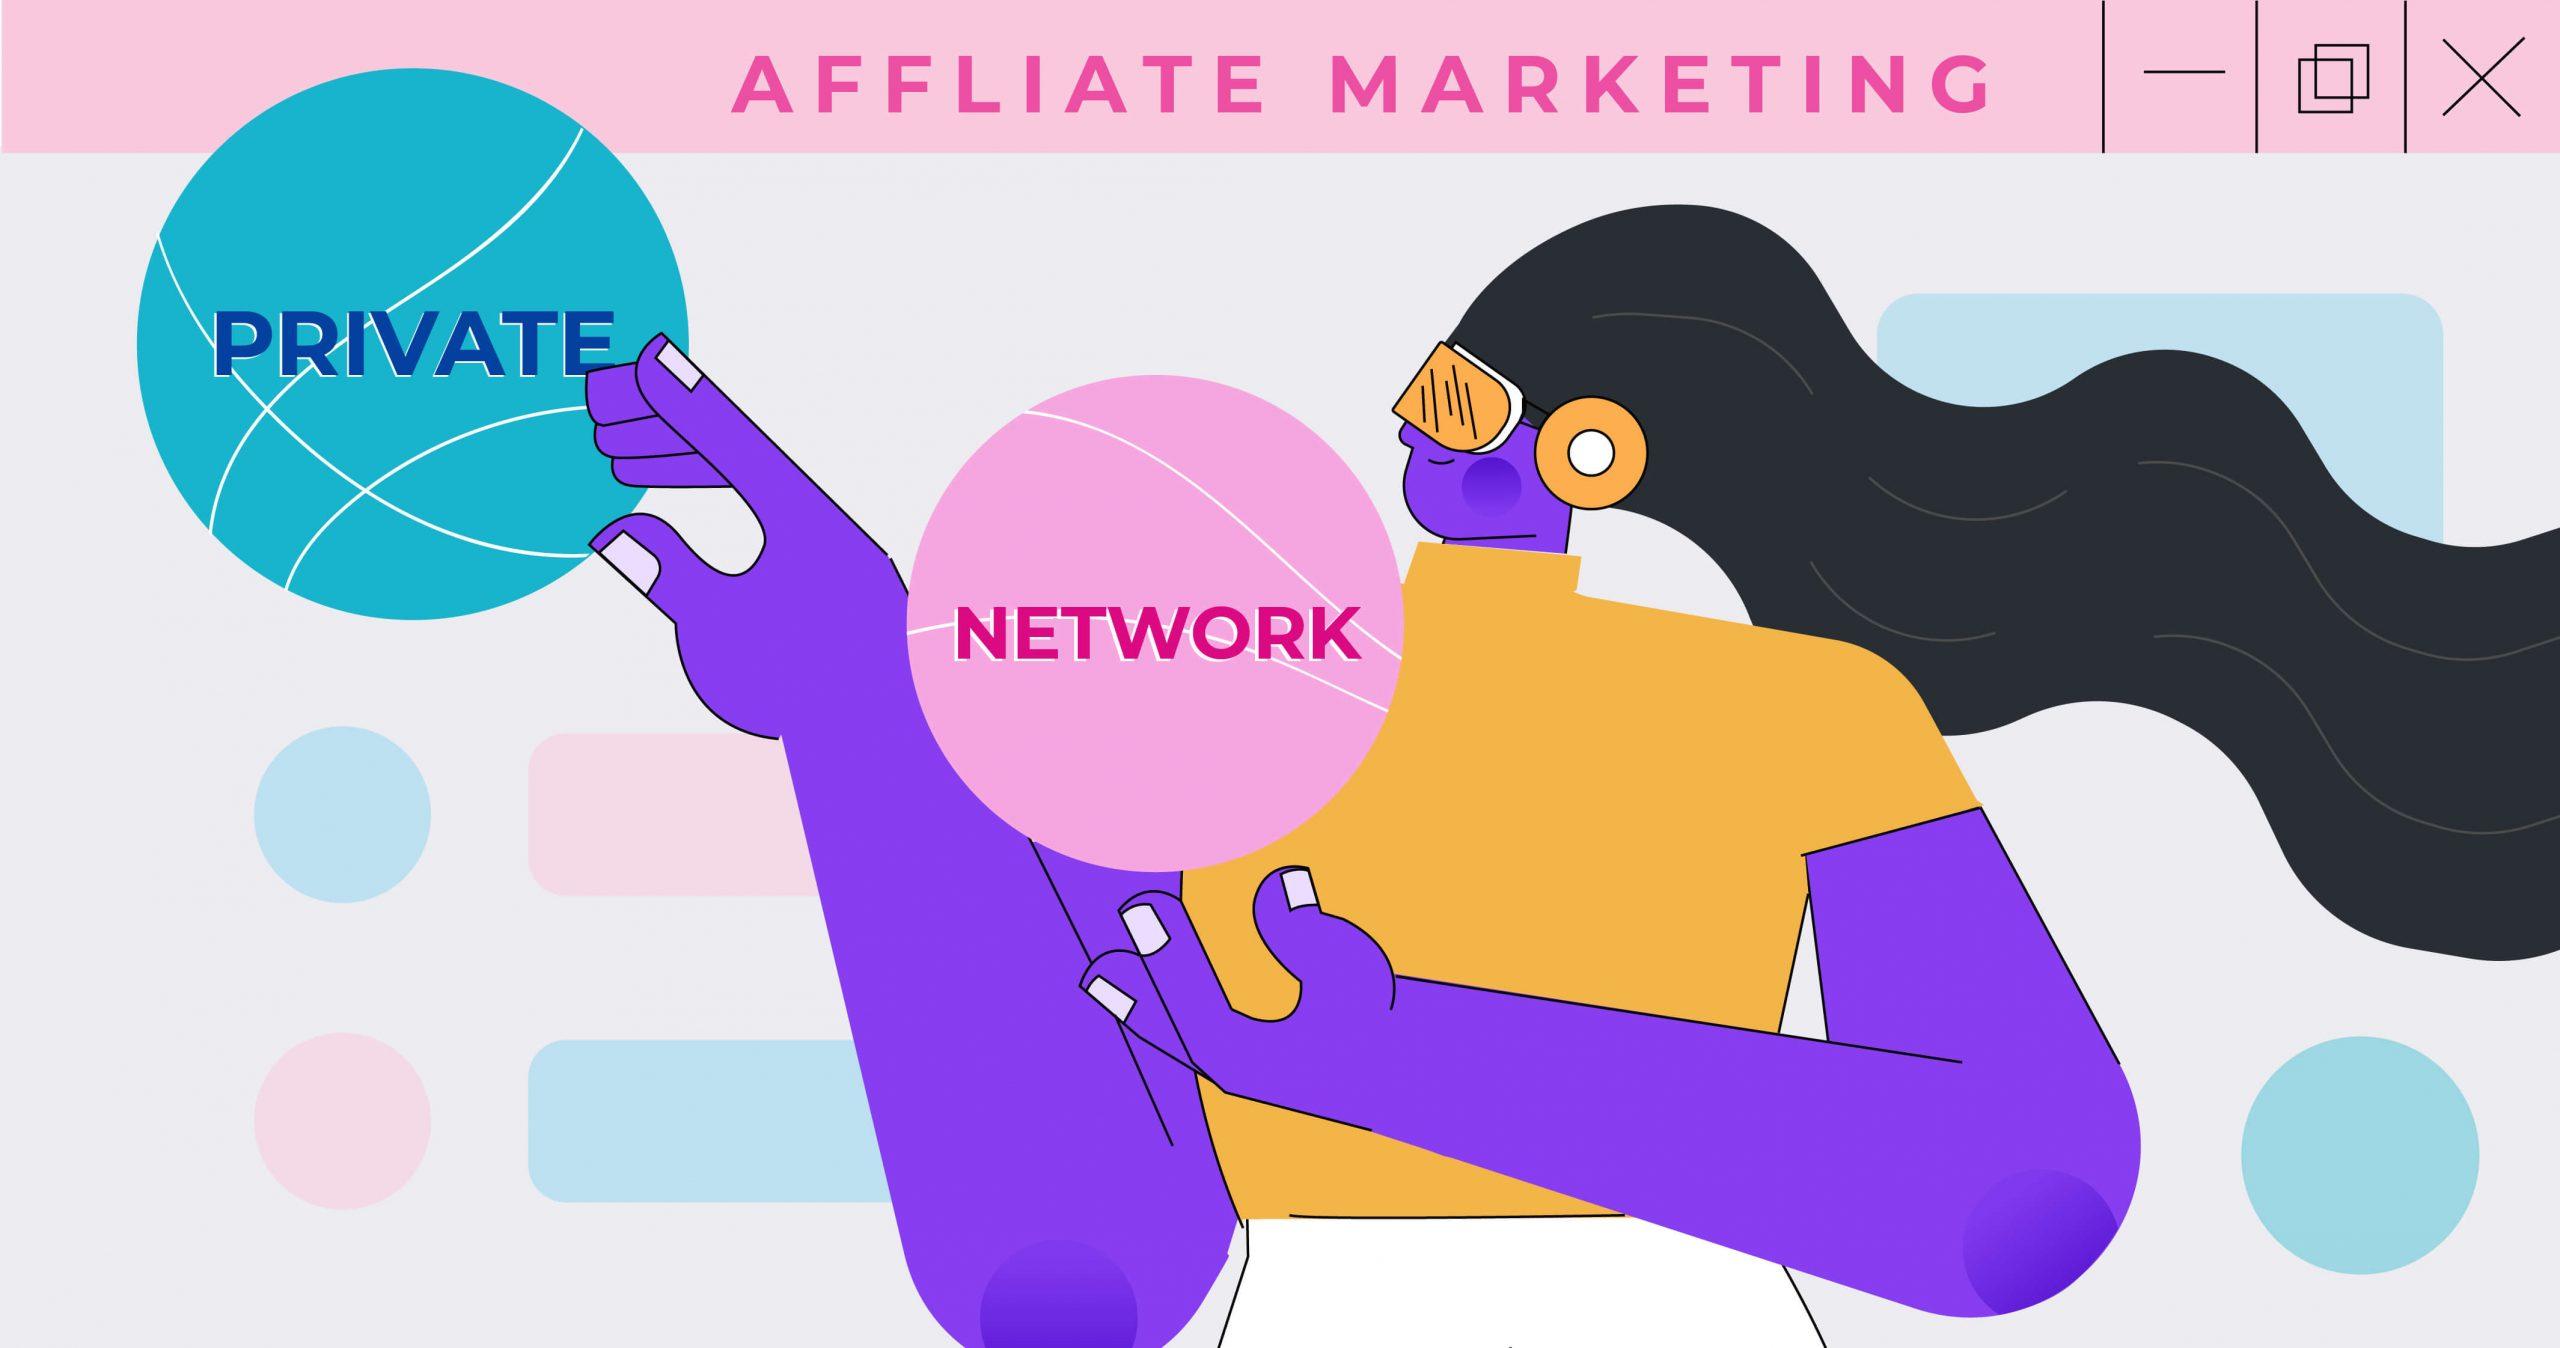 chọn private program hay public network